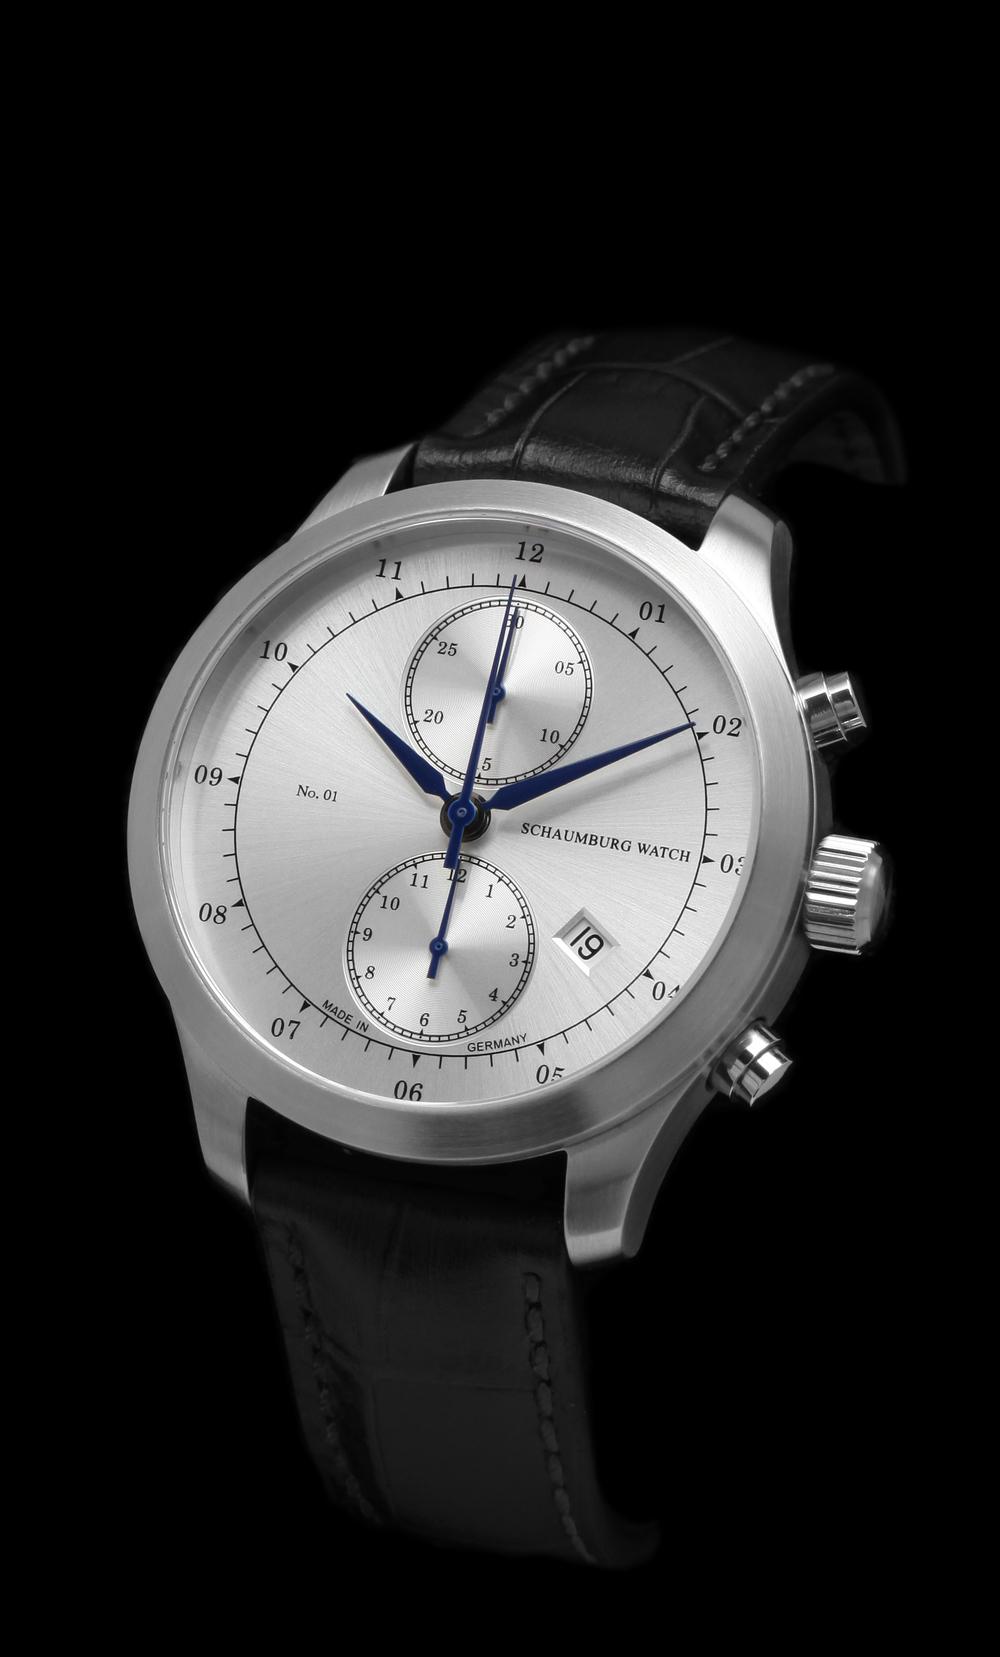 Schaumburg Watch Chronograph No. 01